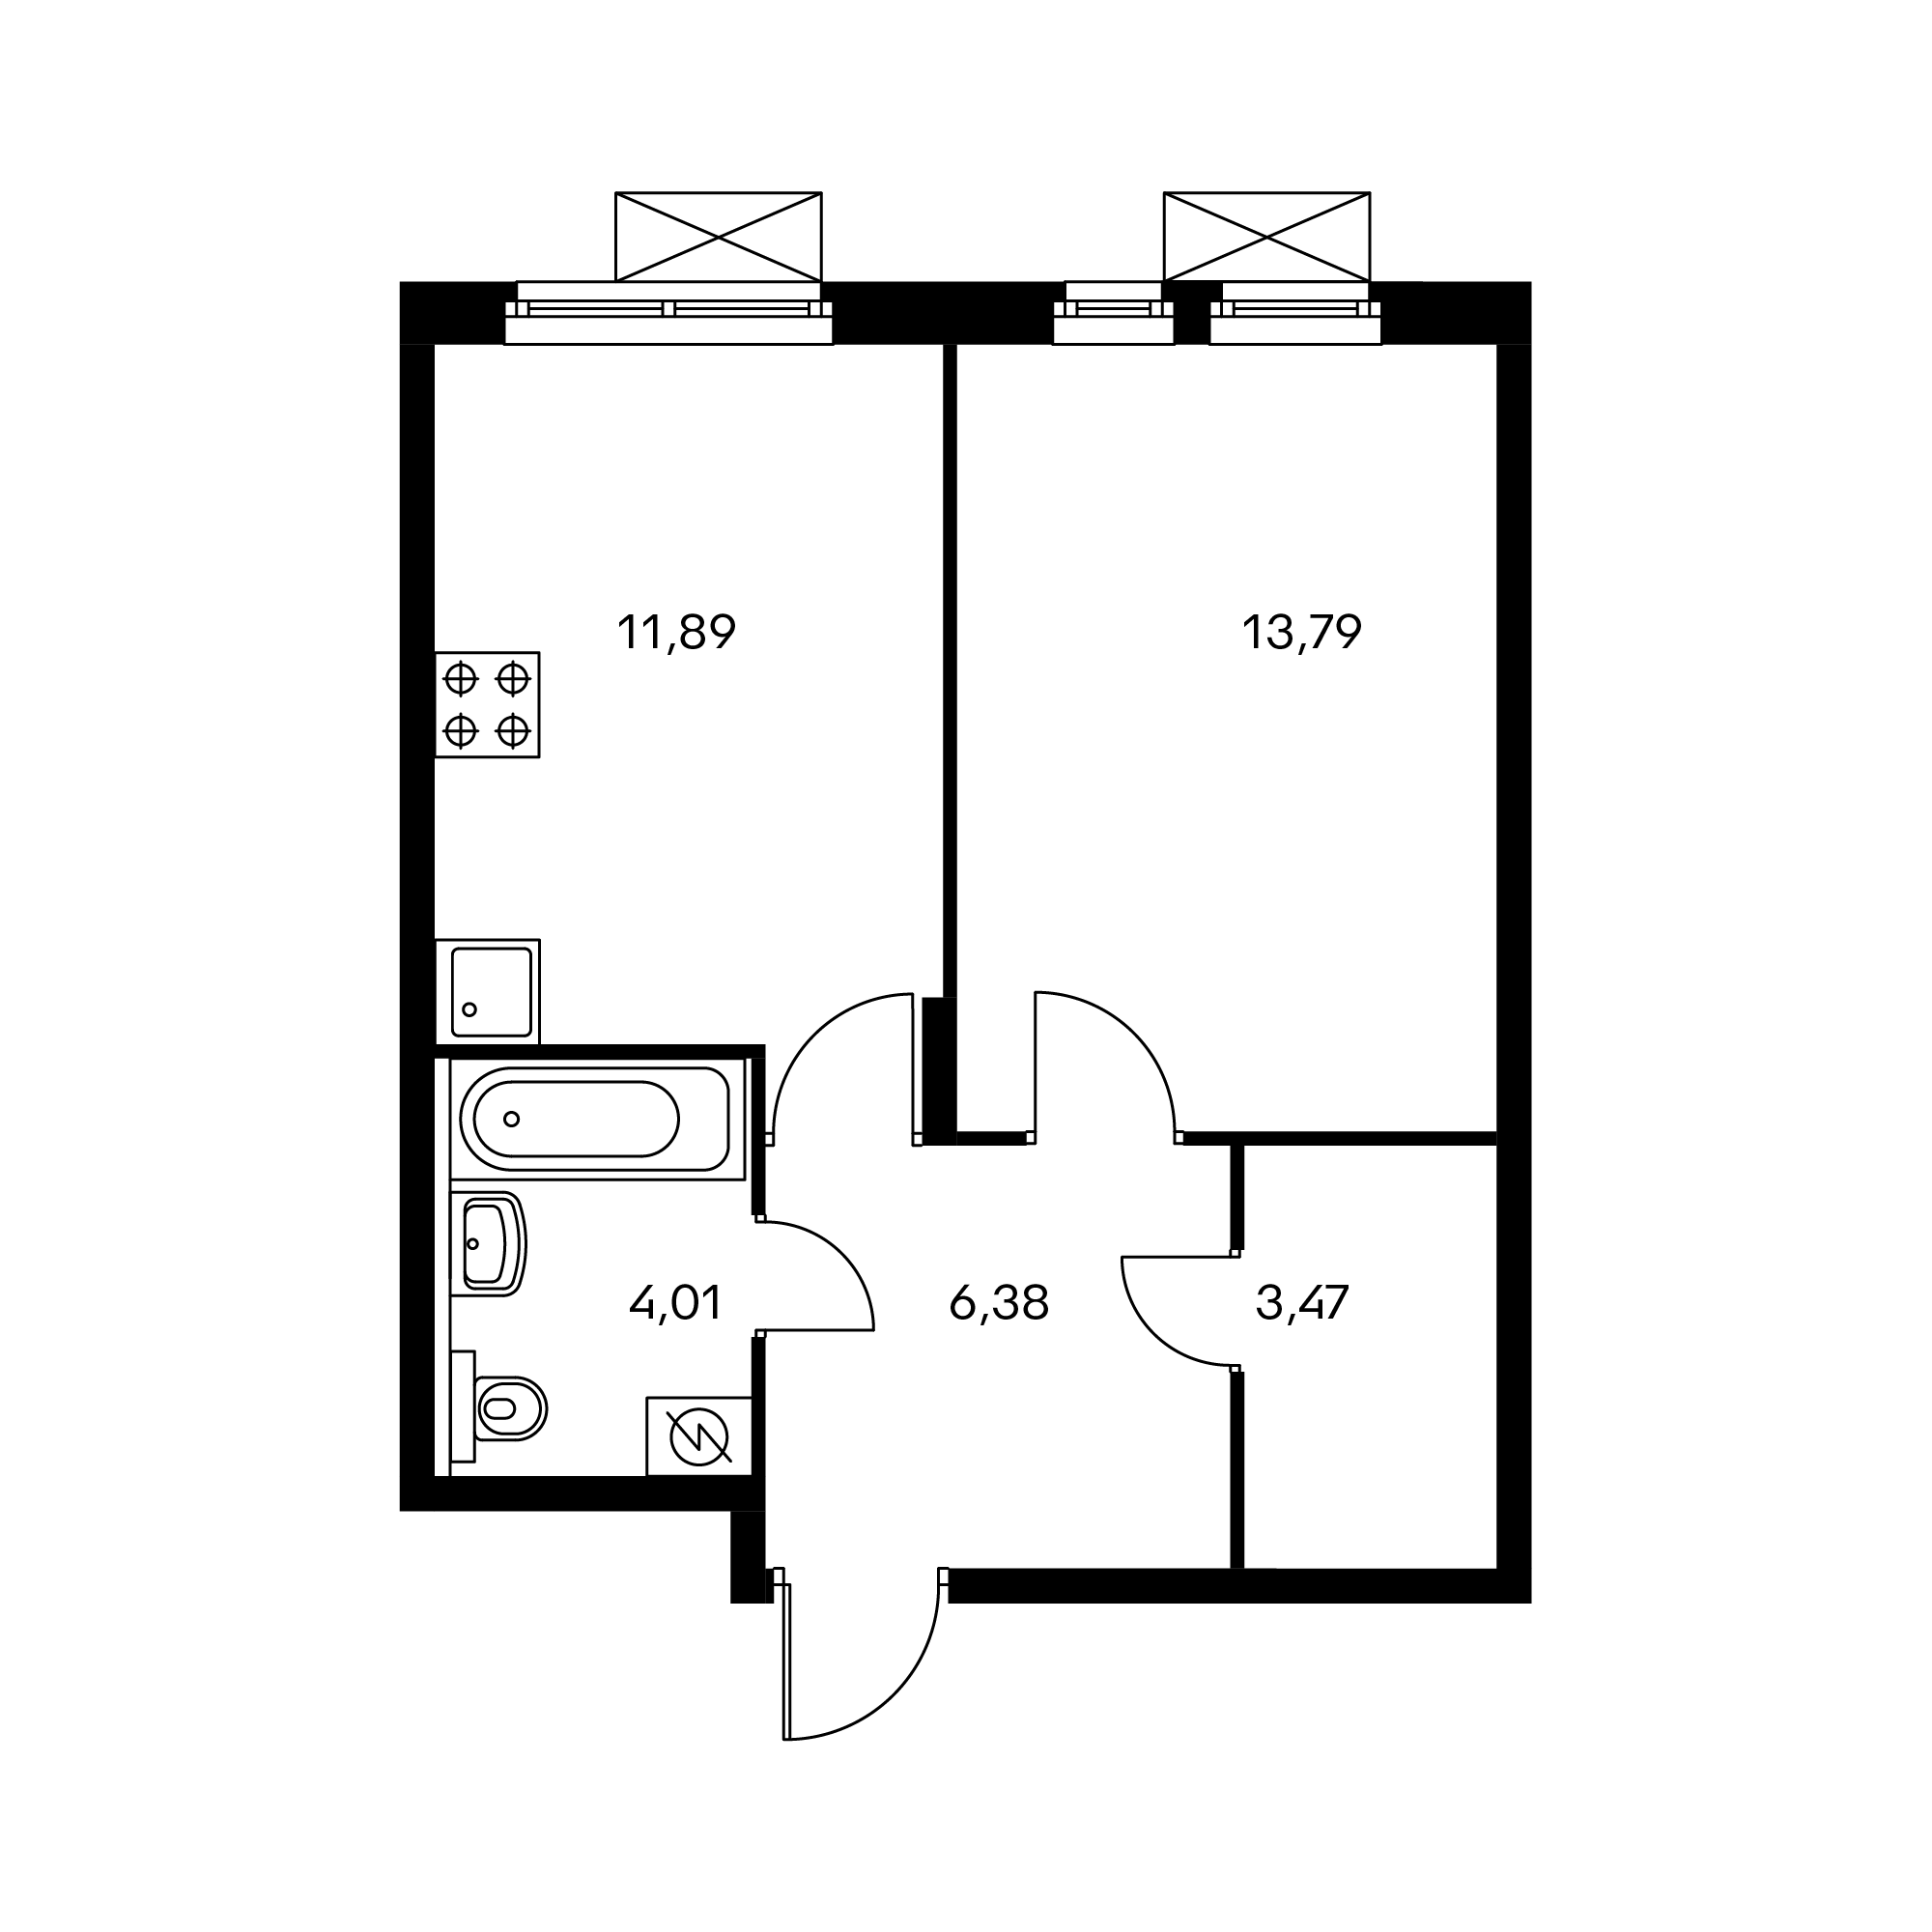 1KM4_6.3